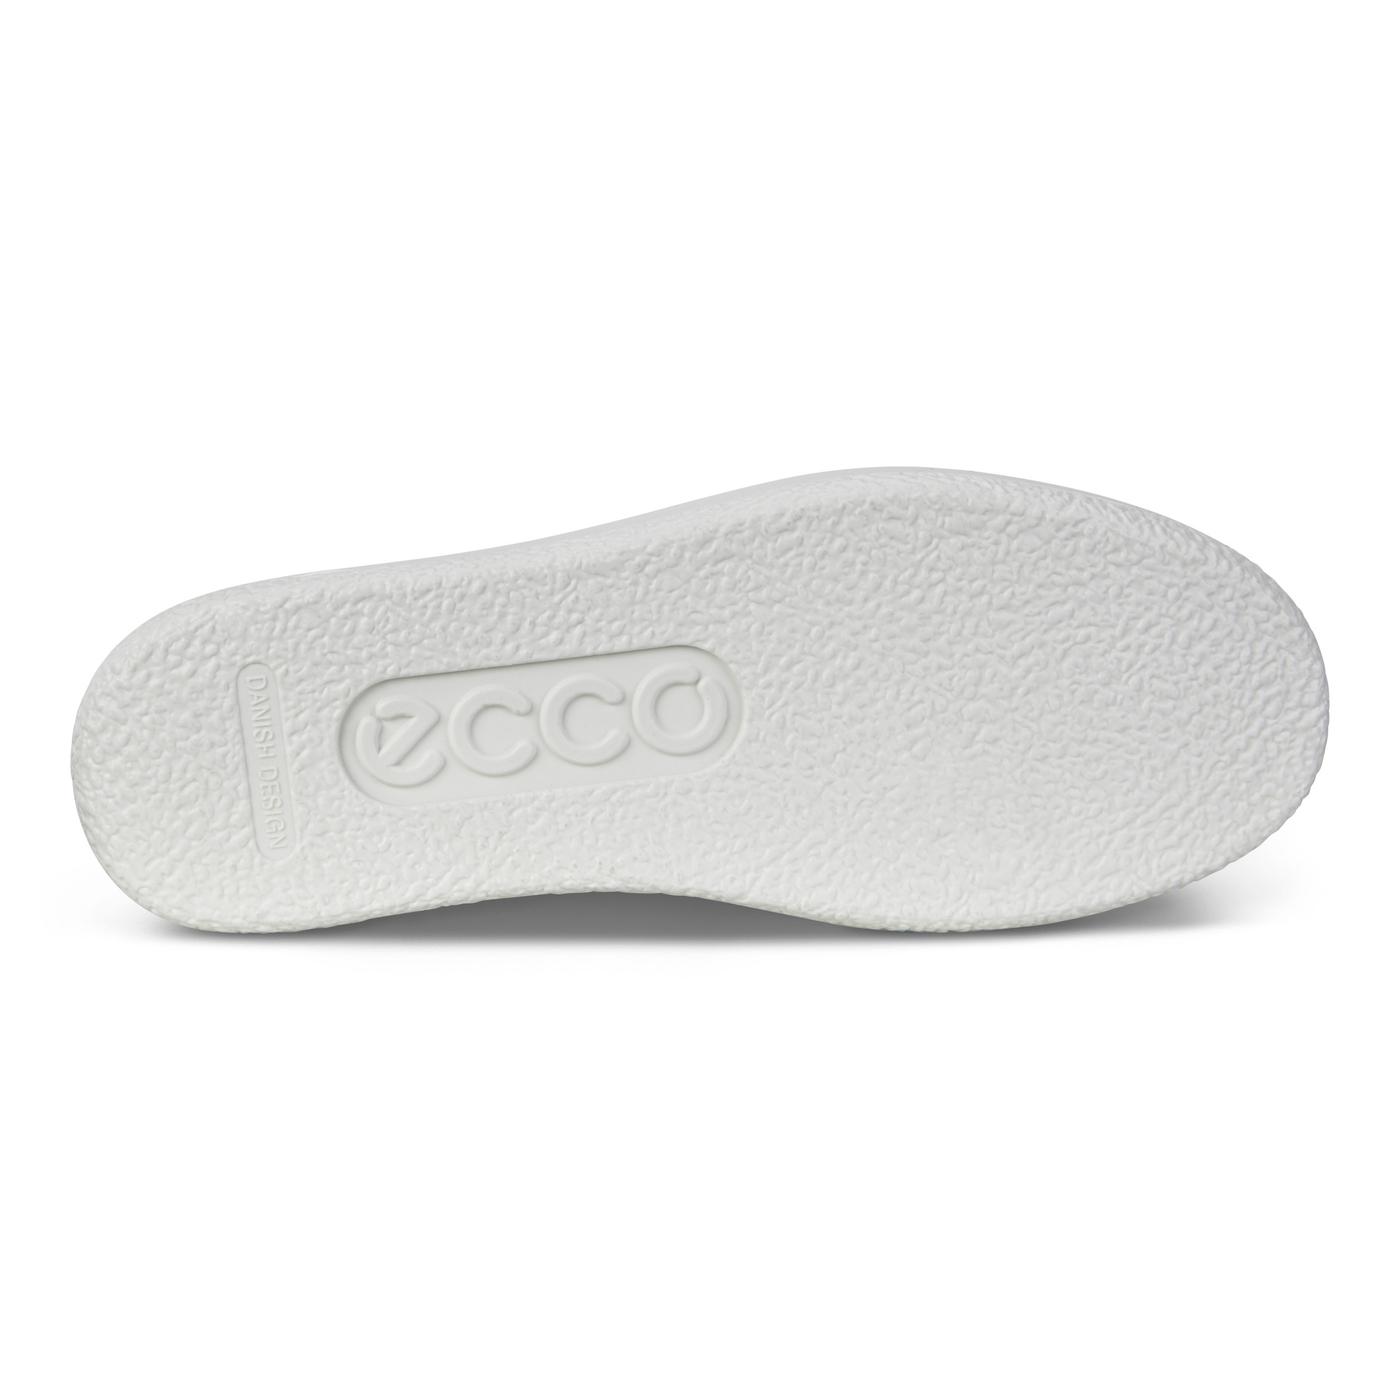 ECCO SOFT 1 W Slip-on